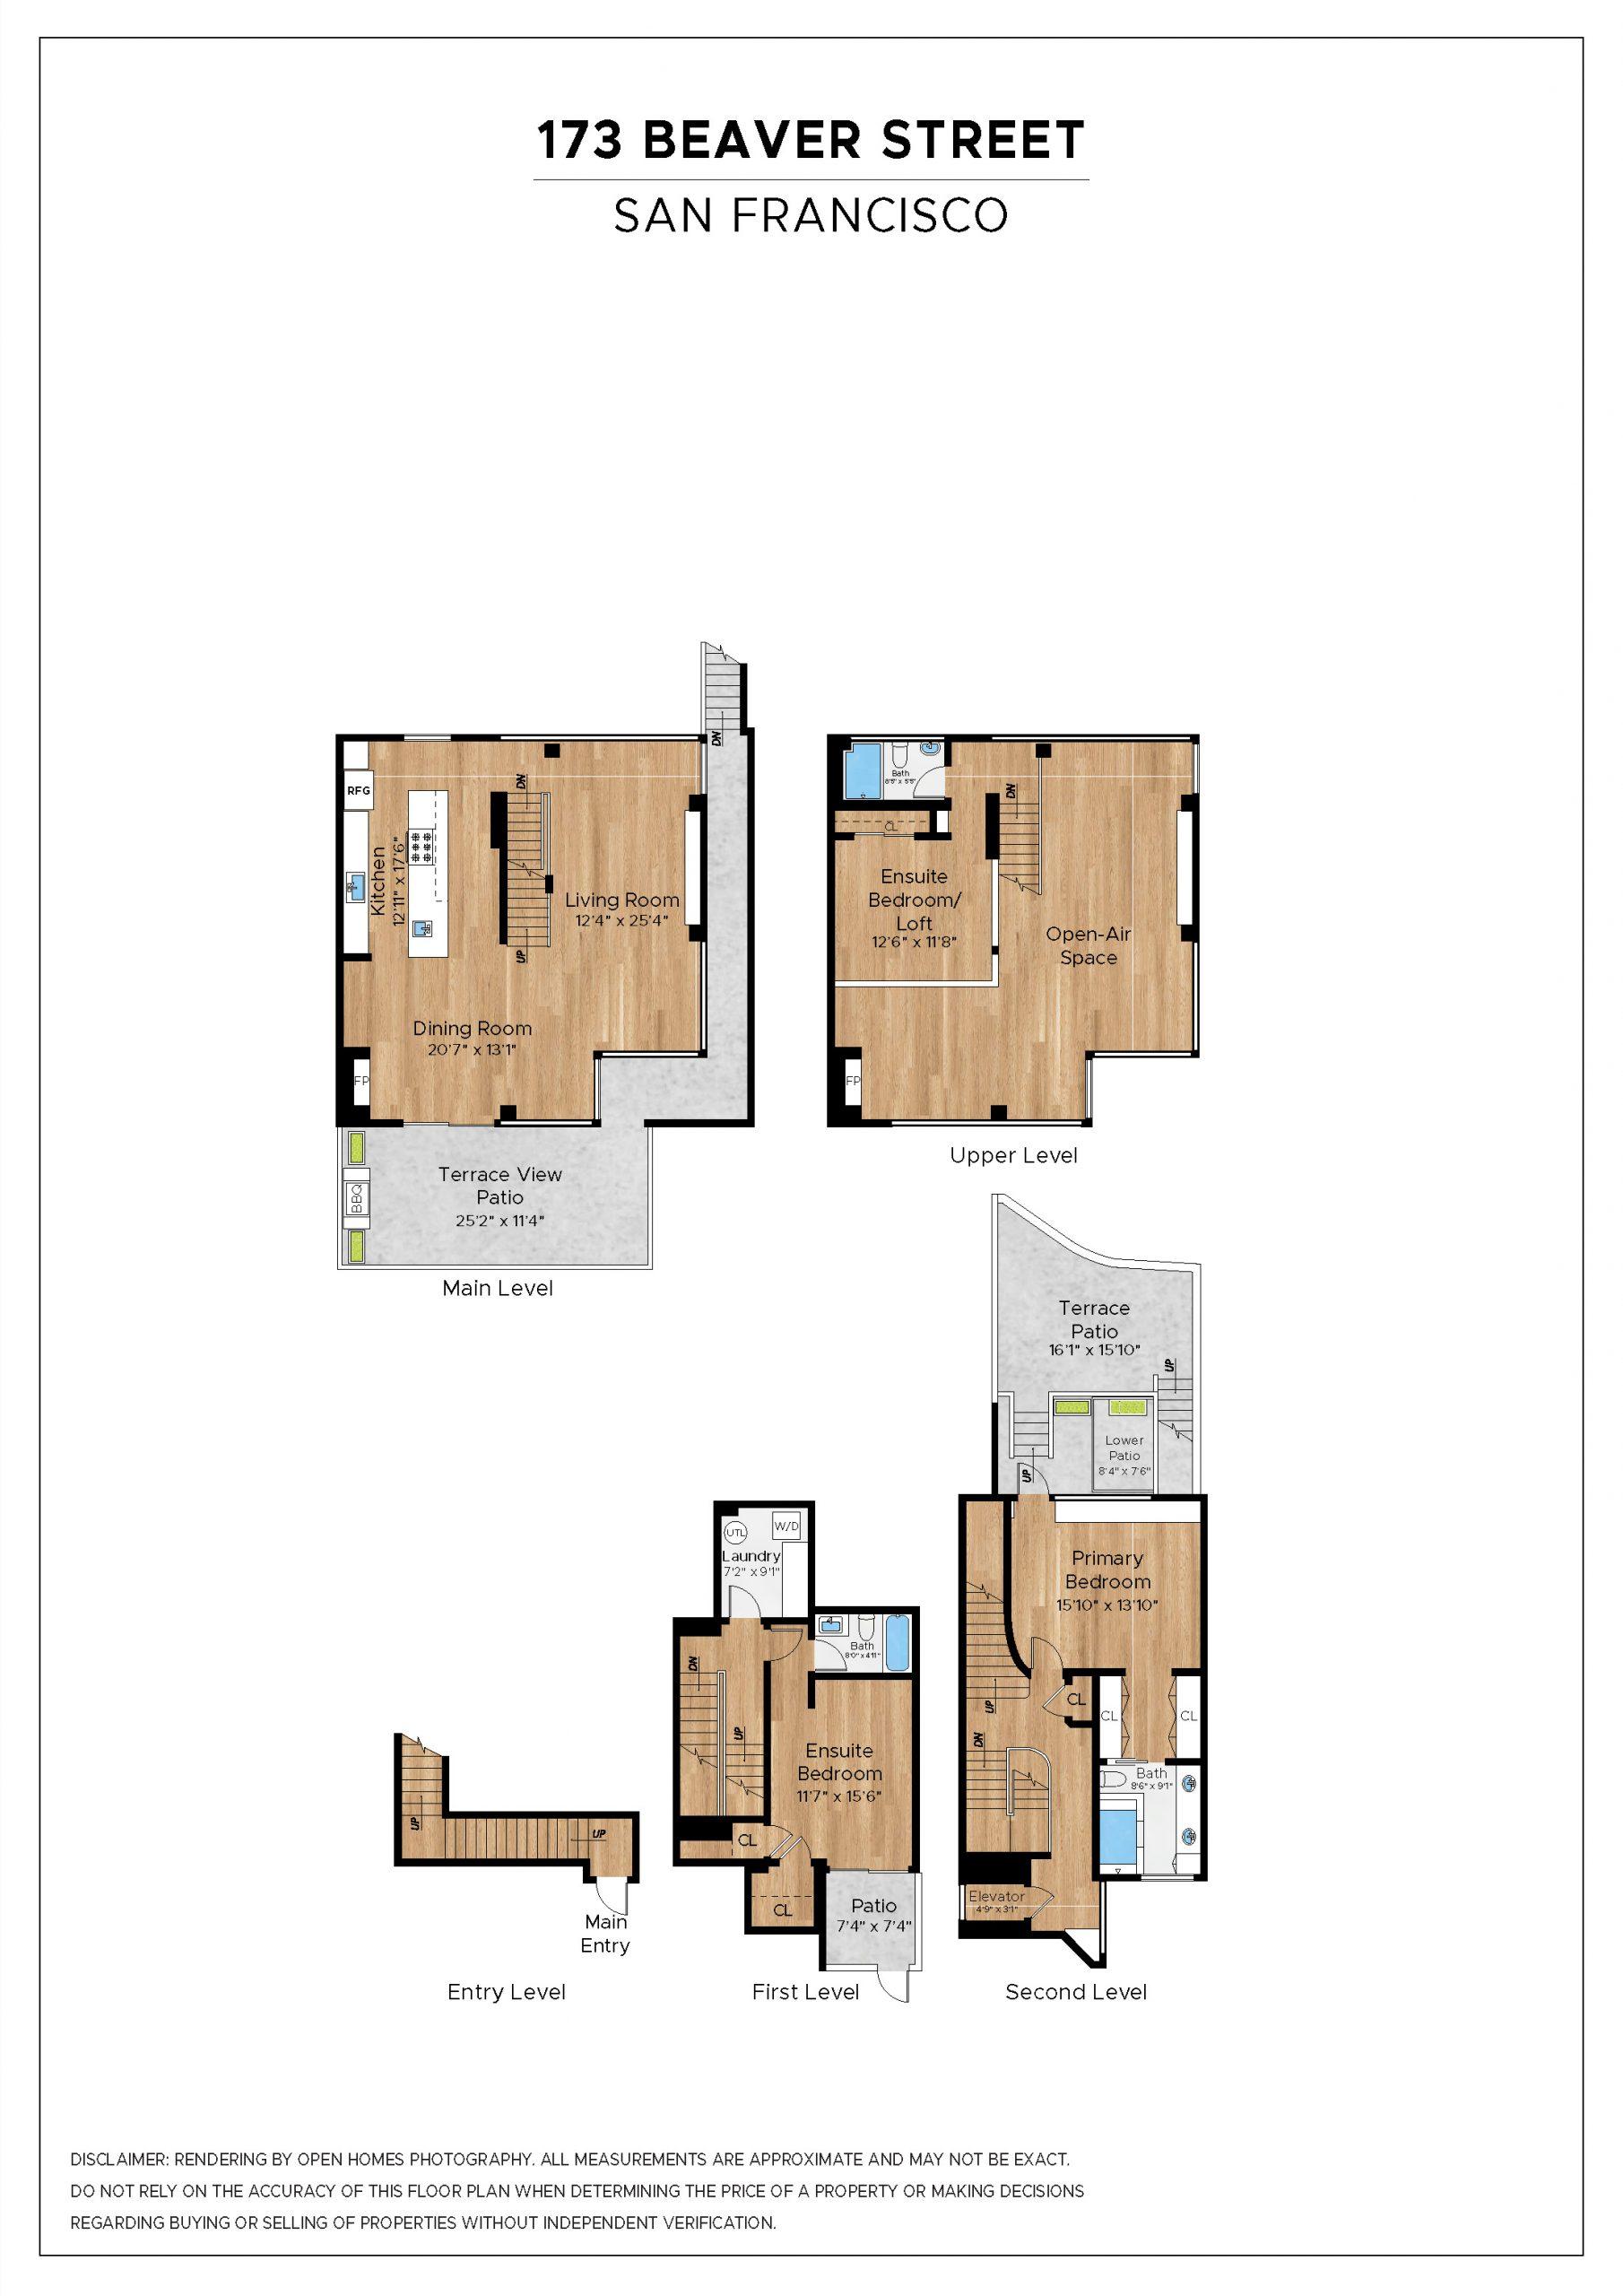 Floor plan of San Francisco home